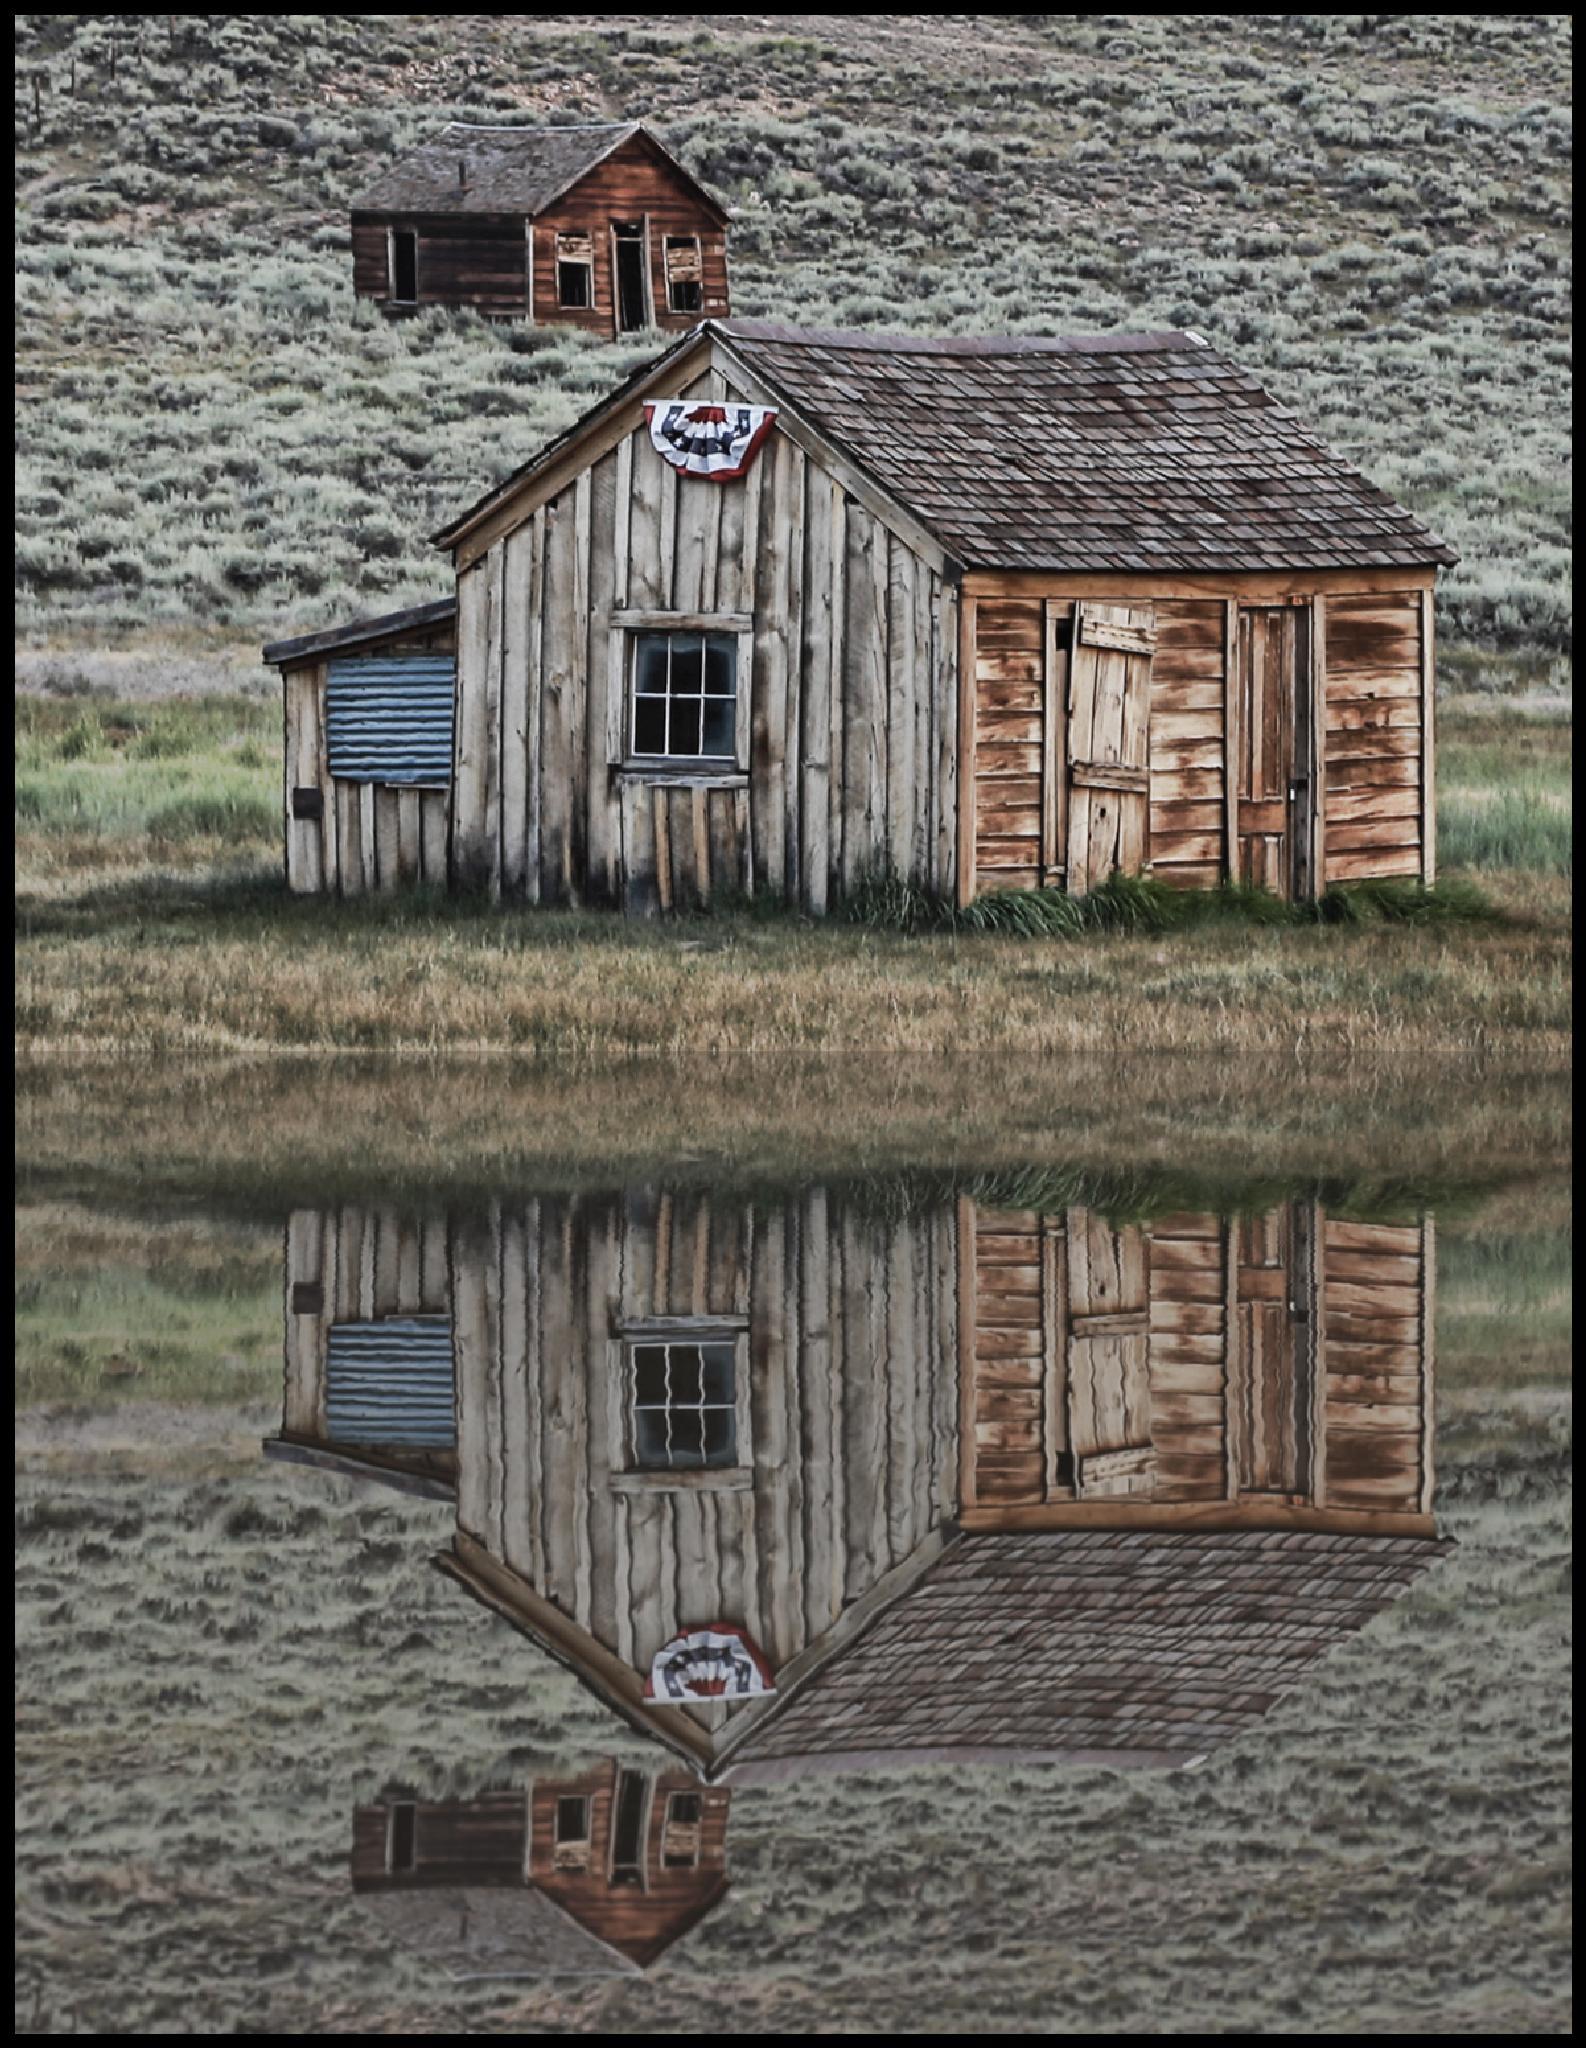 Reflection by Linda Ruiz